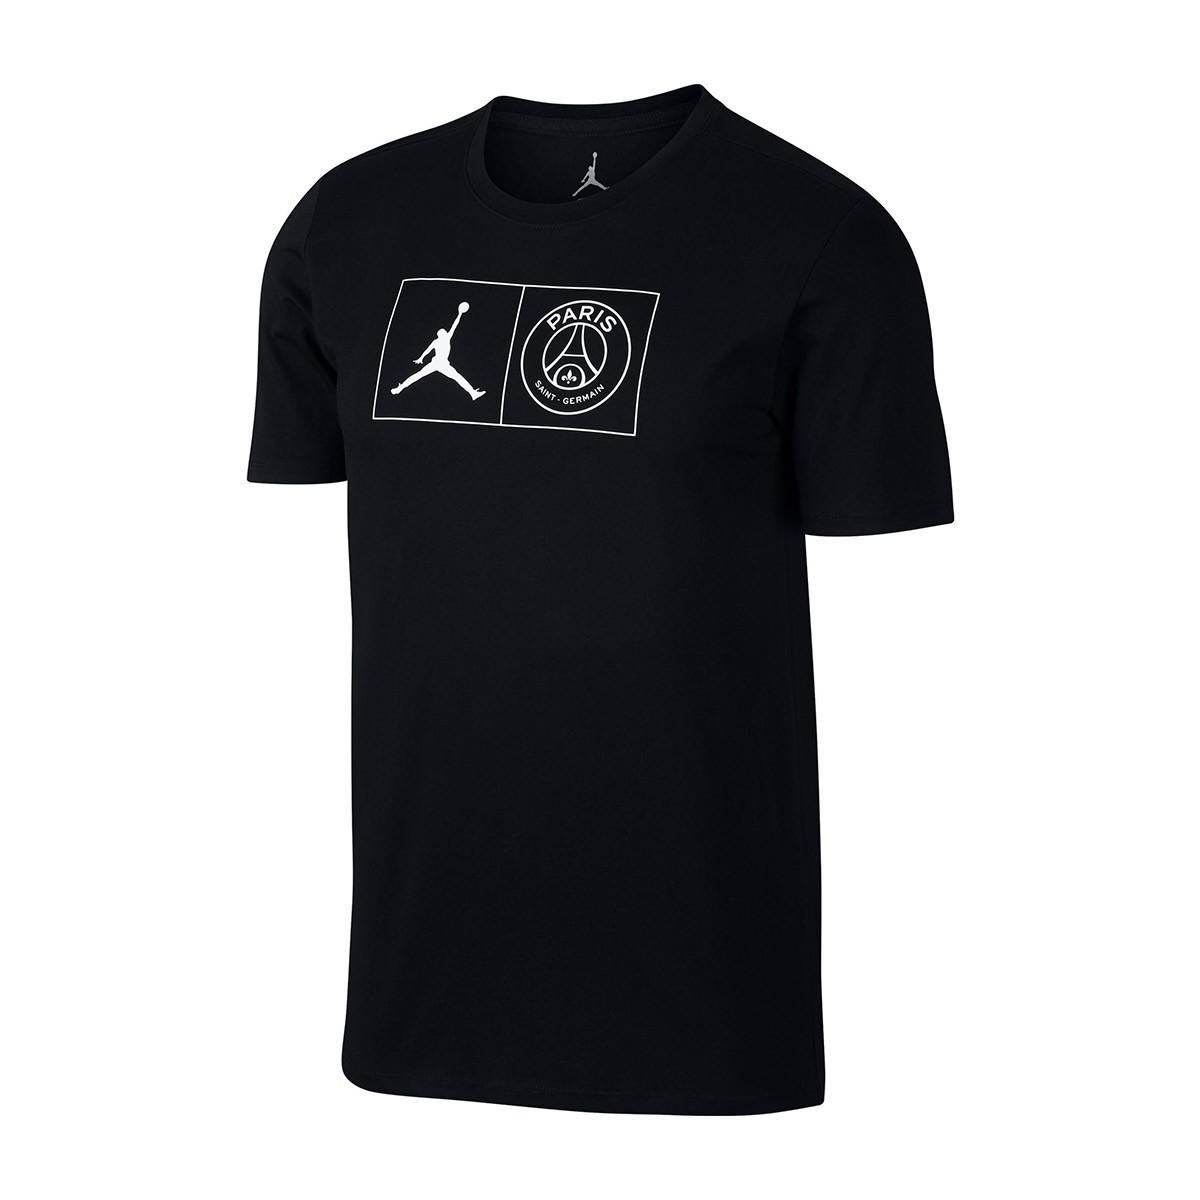 eca23c8bd Futbalové kluby (všetky) | Nike Jordan Paris Saint Germain - PSG ...